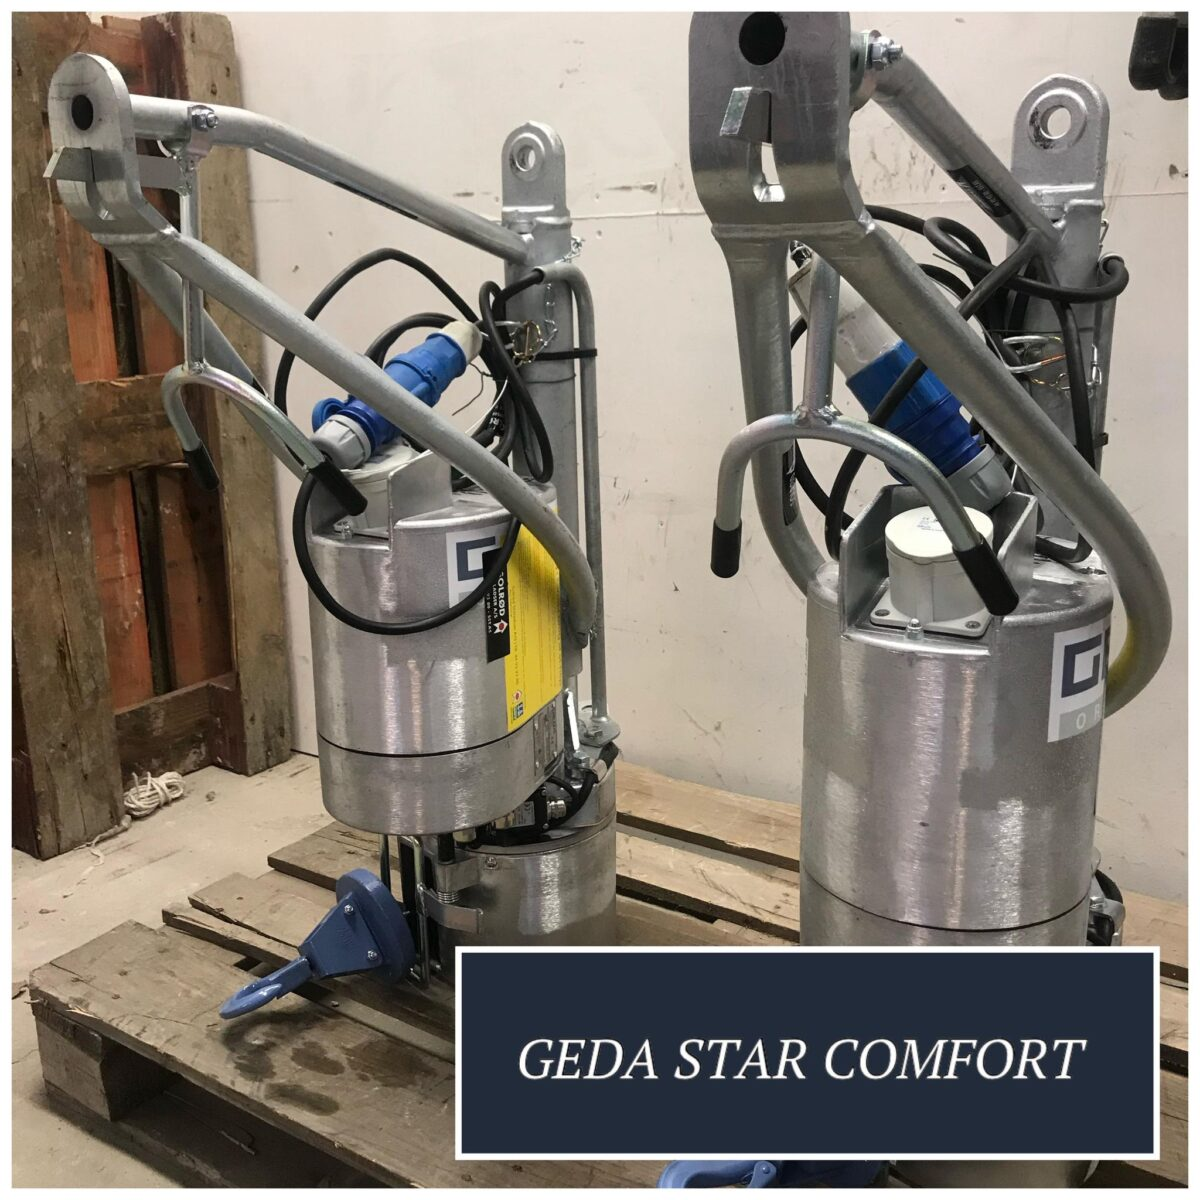 Wirehejs som materialeelevator - GEDA Star 250 Comfort